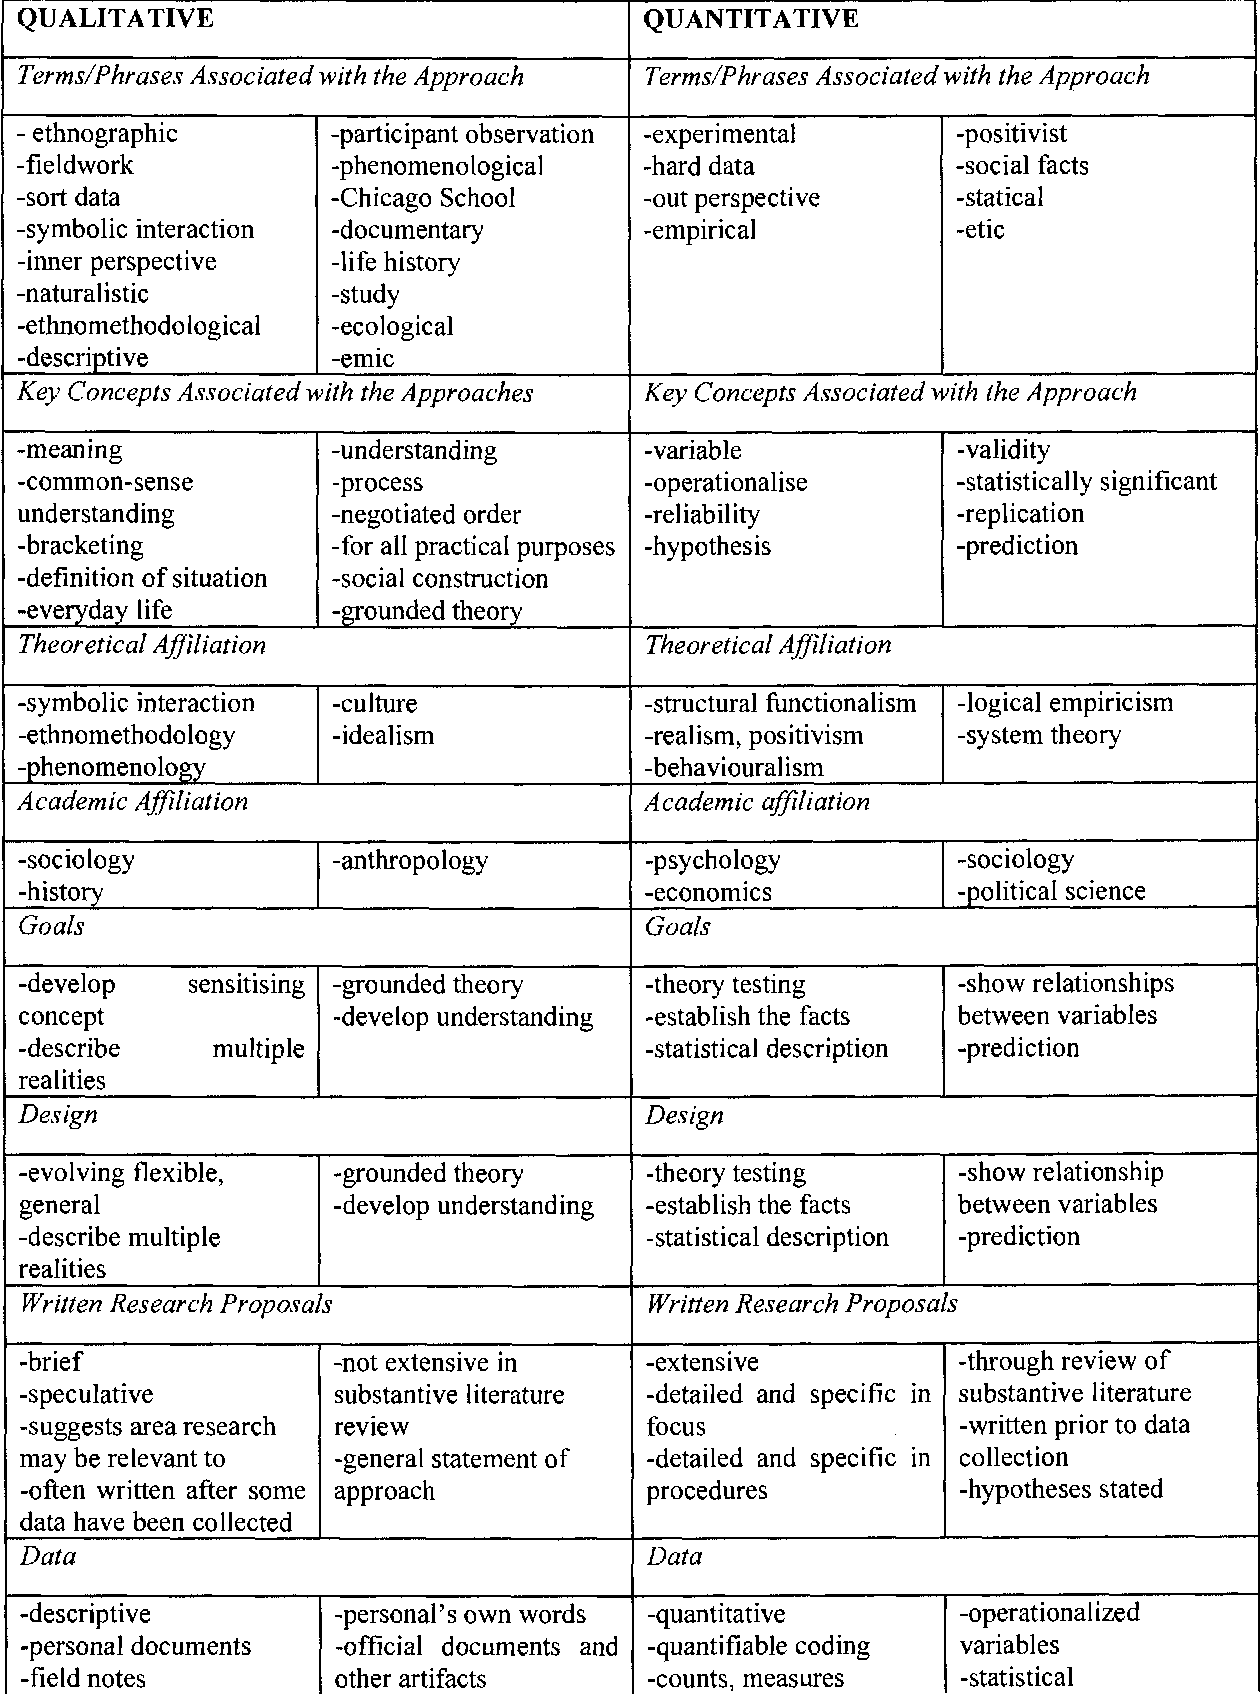 Table 3 7 from Grade 1 teachers' involvement in school-based